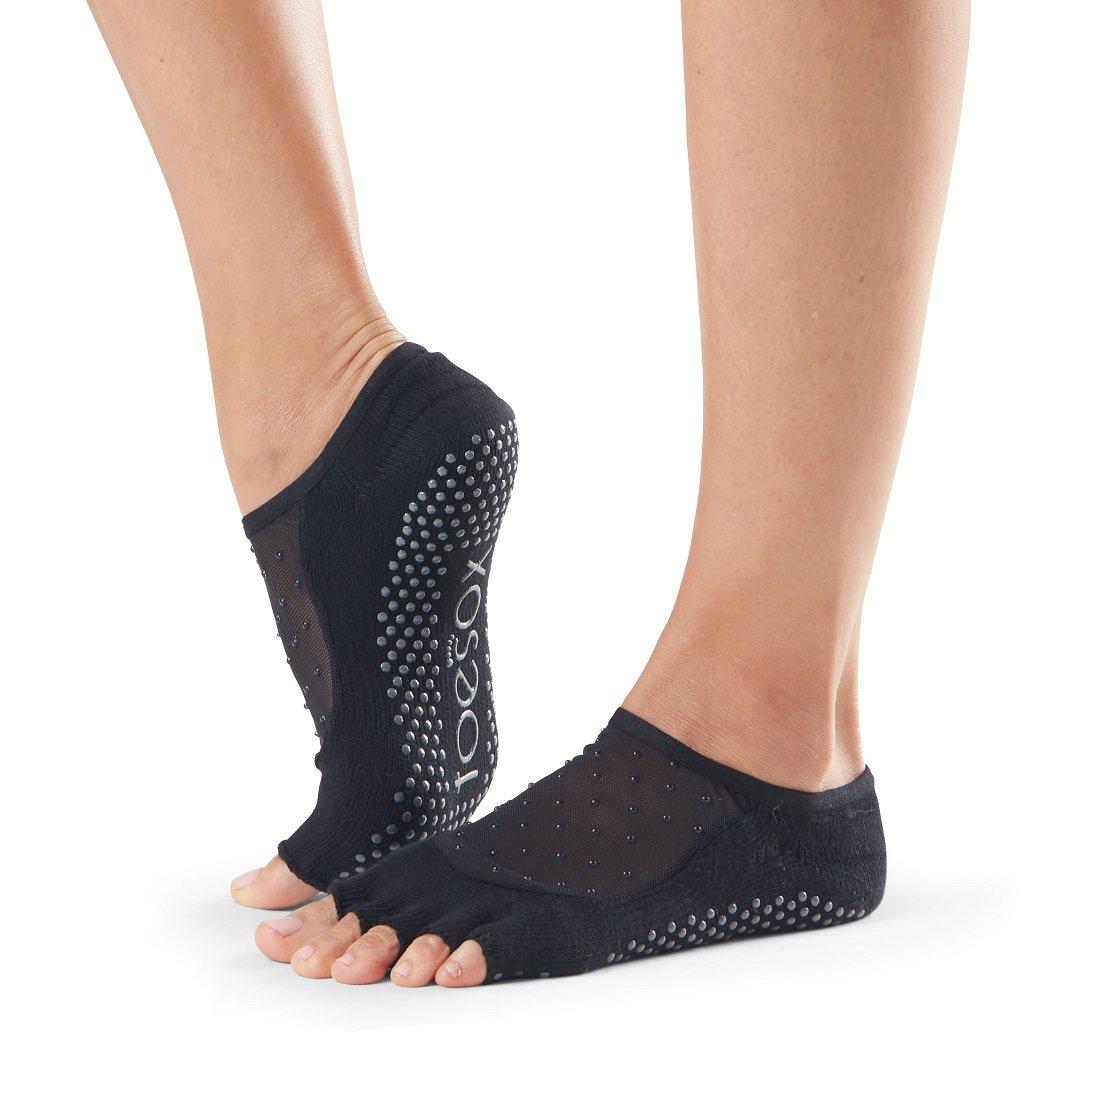 Toesox Grip Pilates Barre Socks - Non Slip Luna Half Toe for Yoga & Ballet